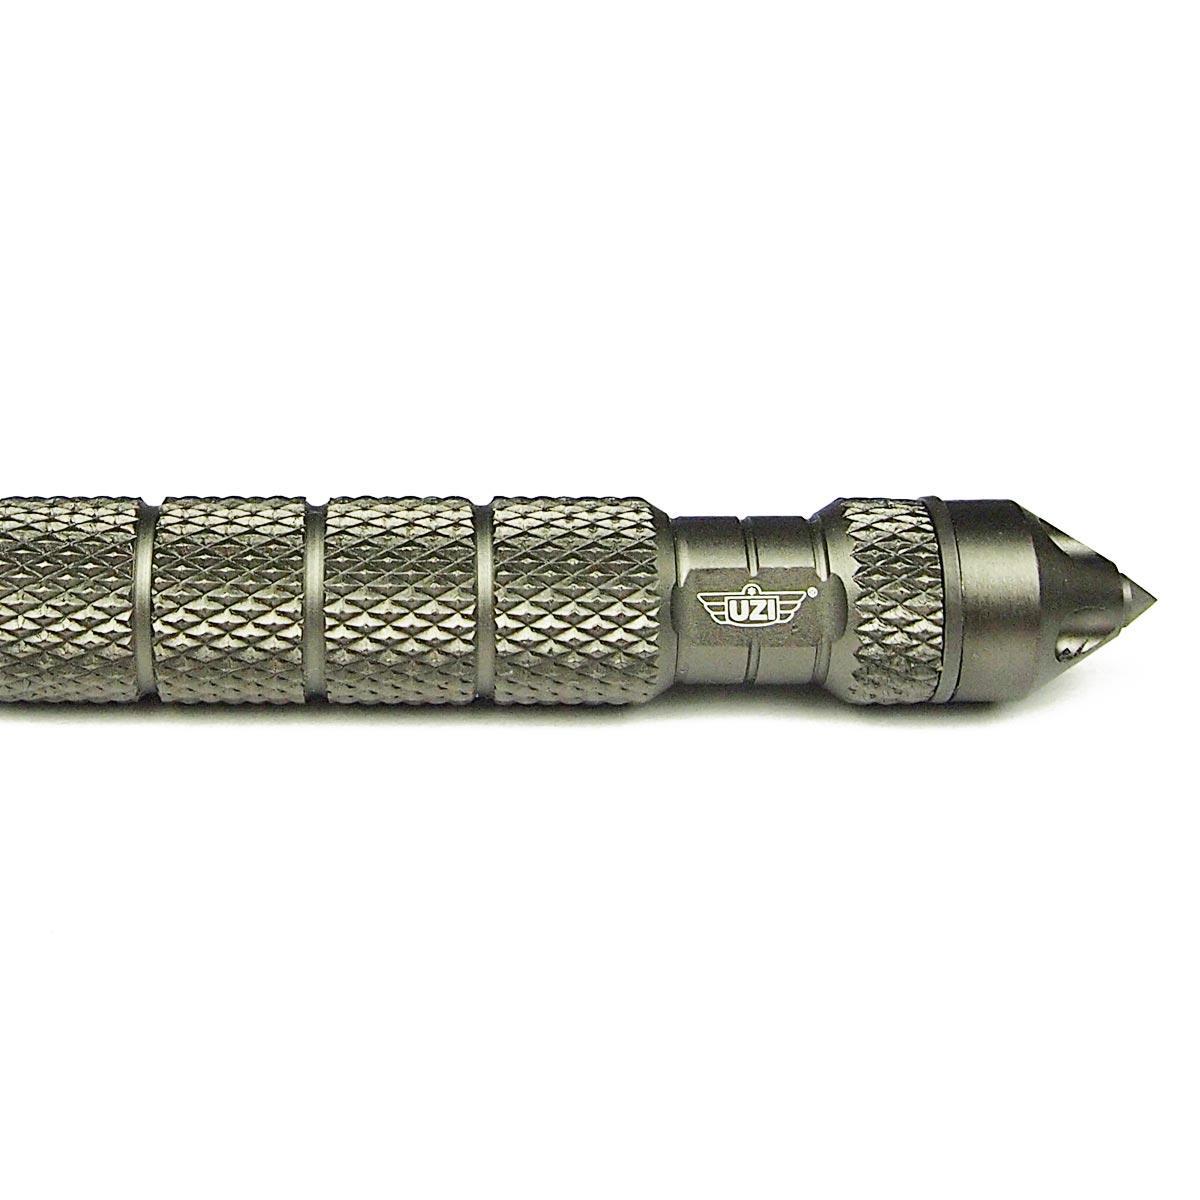 Uzi Tactical Pen mit Glasbrecher Kugelschreiber Kubotan Tac Pen Stift Kuli NEU